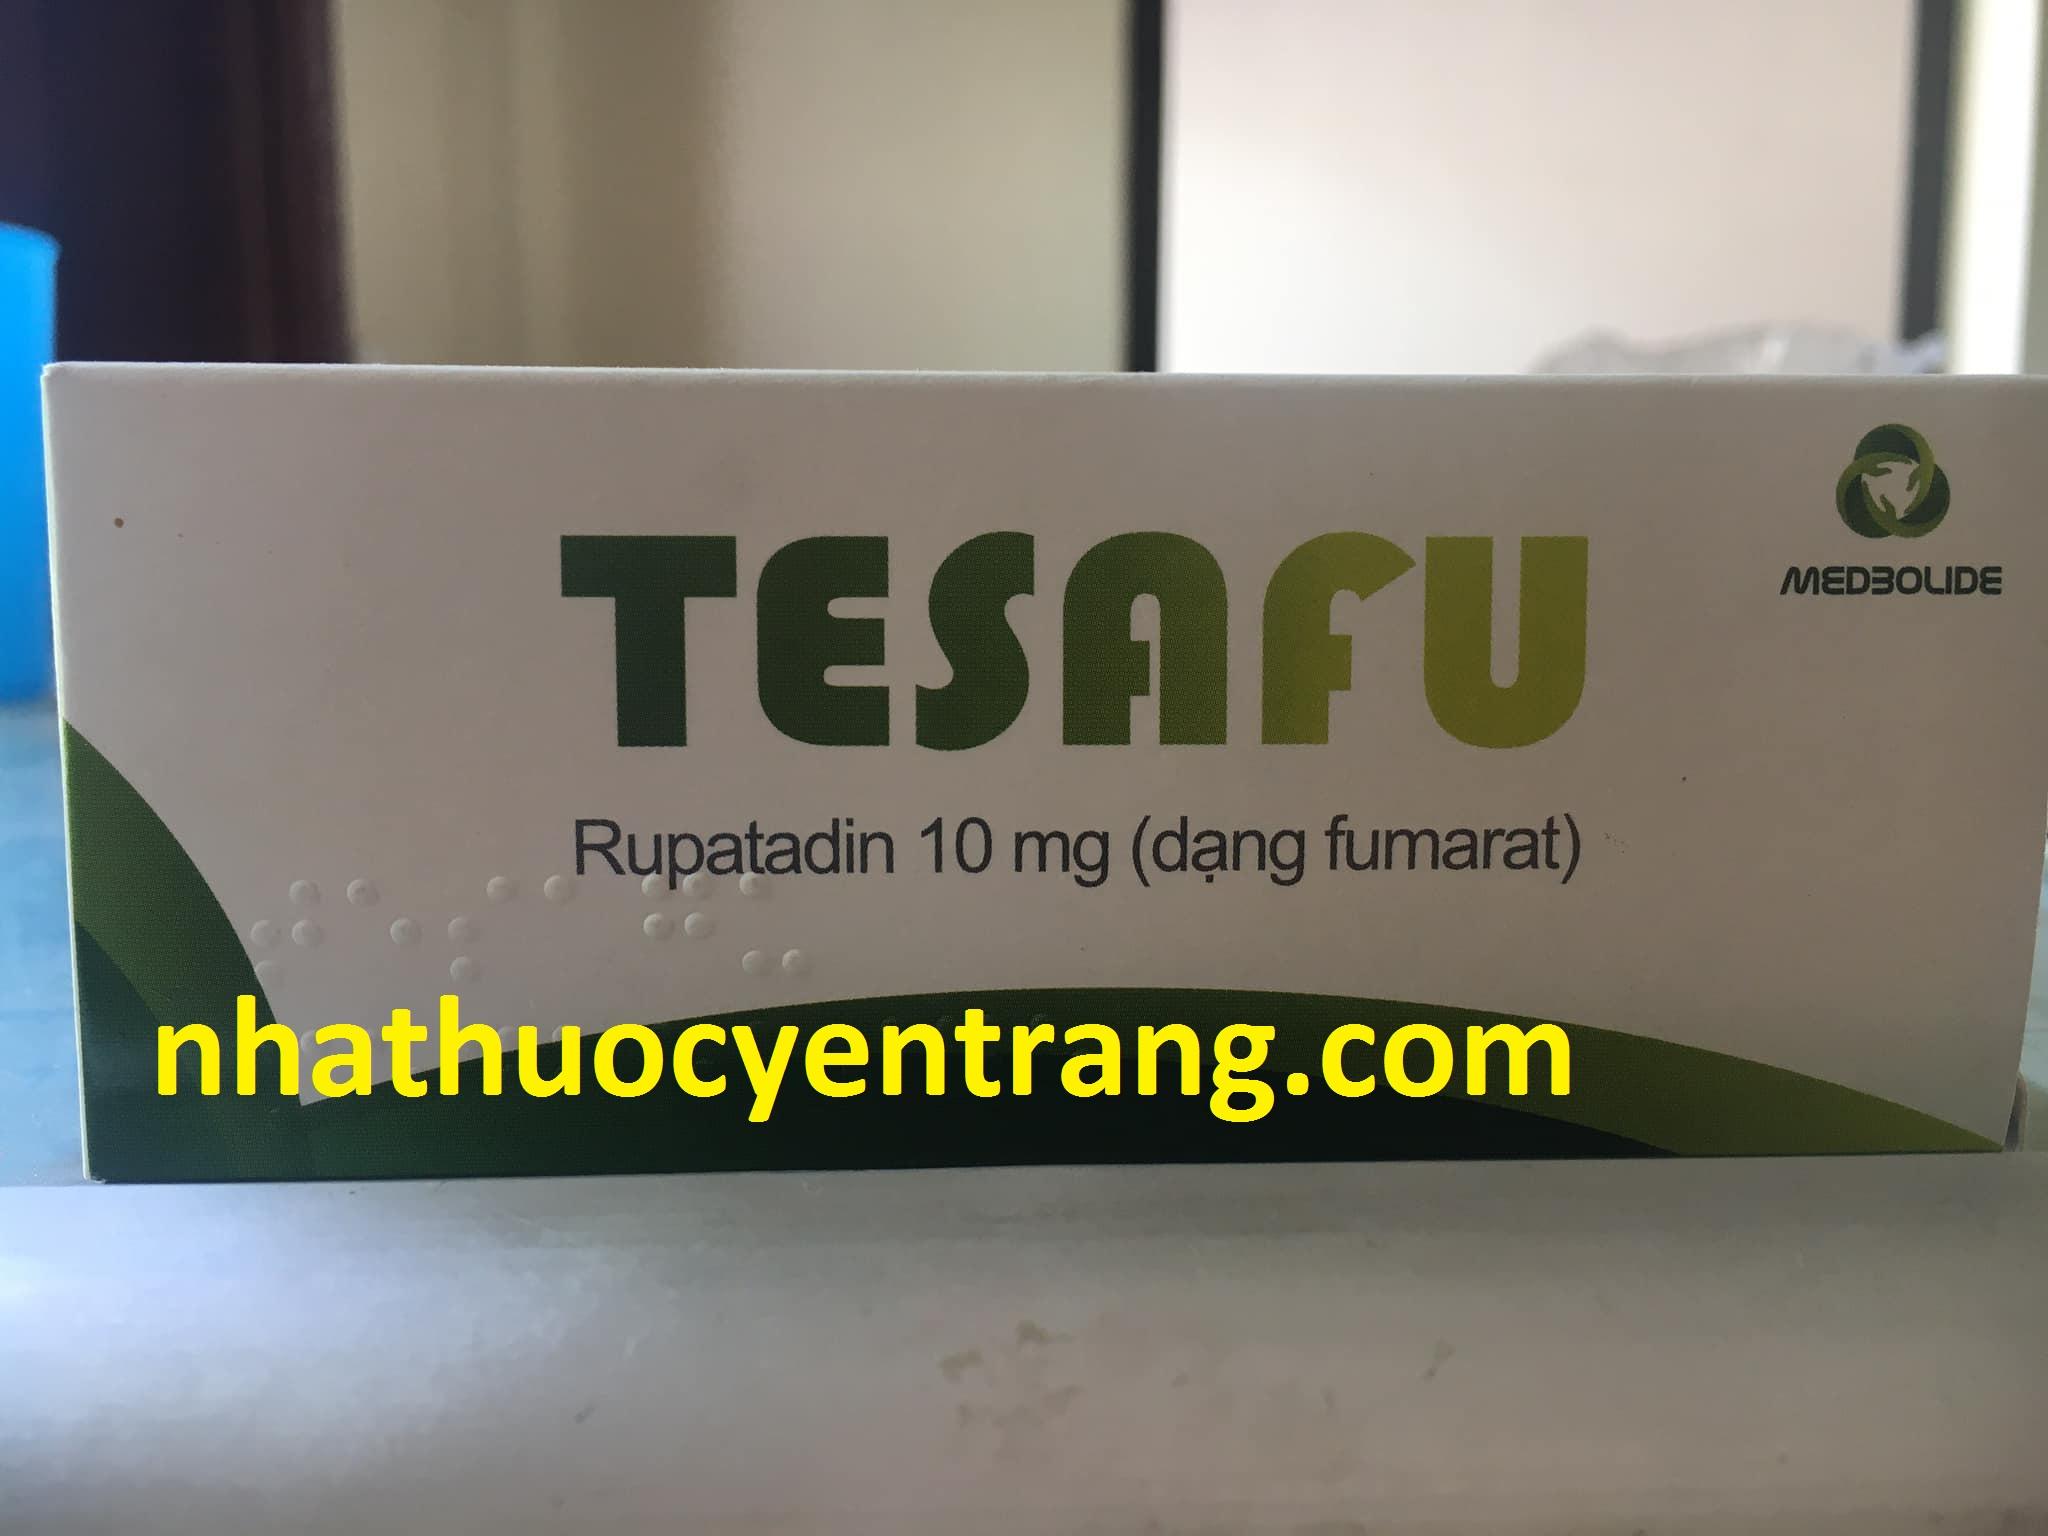 Tesafu 10mg